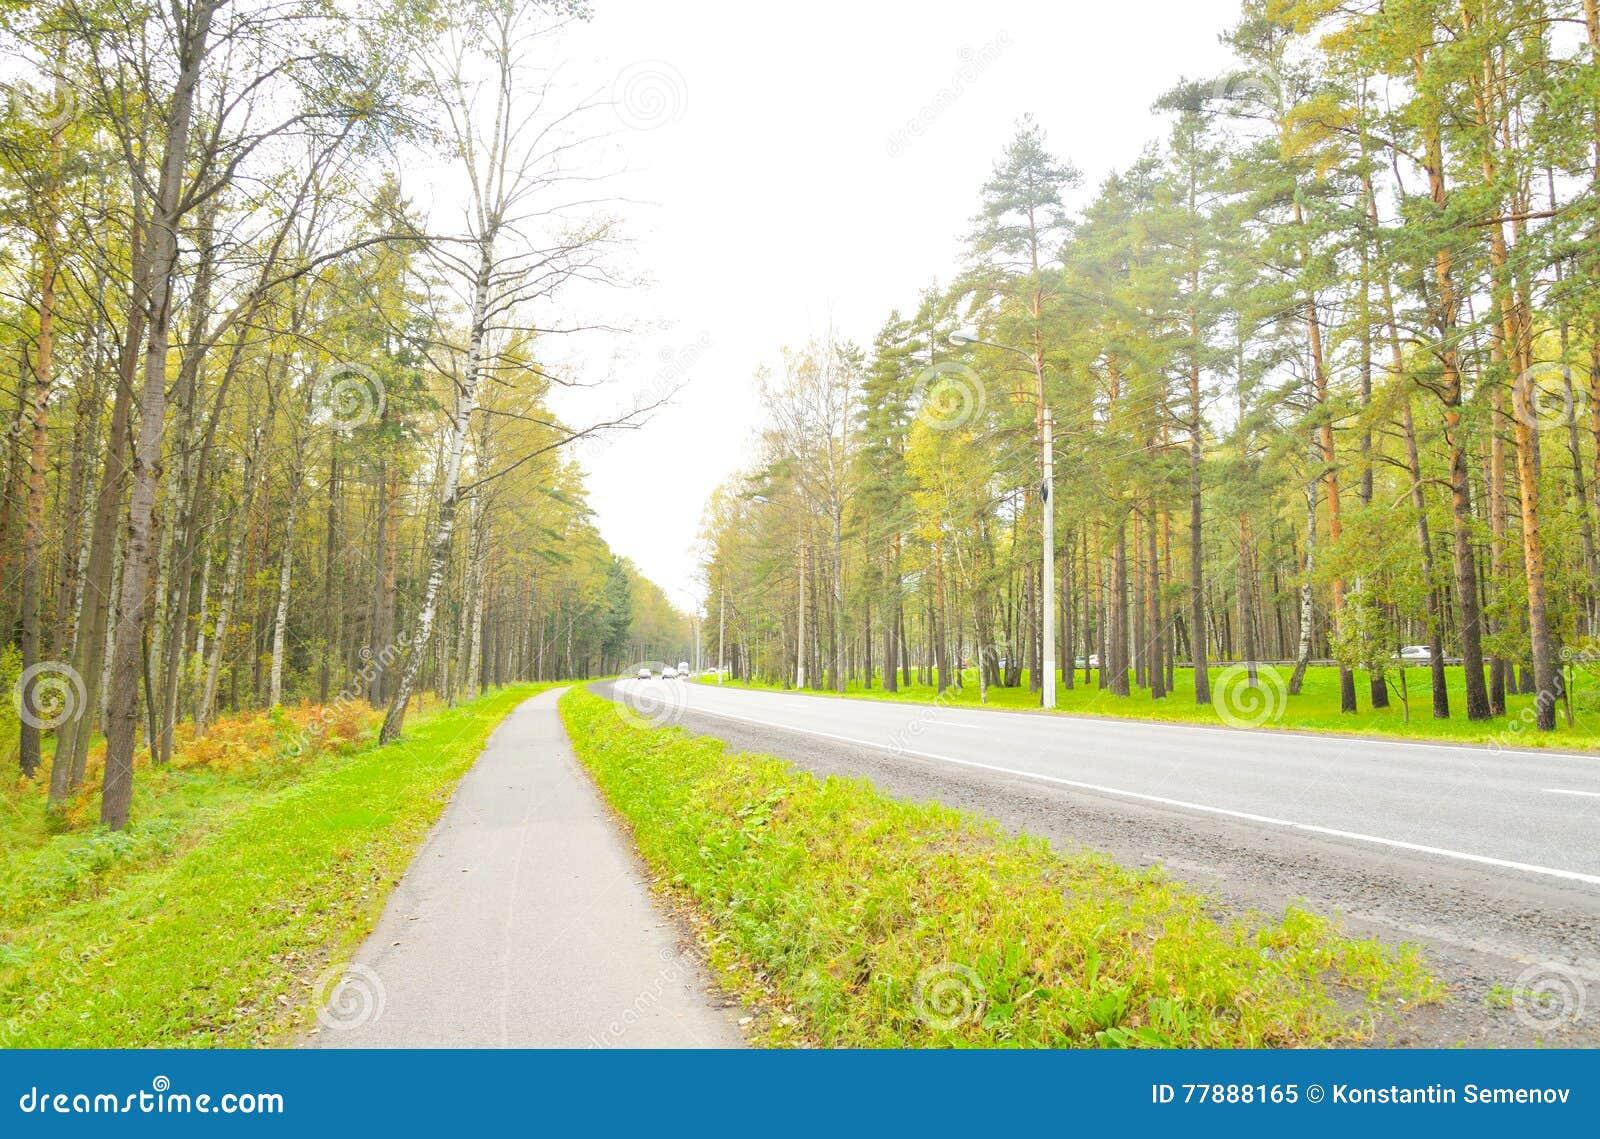 Carretera De Primorskoe En StPetersburg Foto de archivo